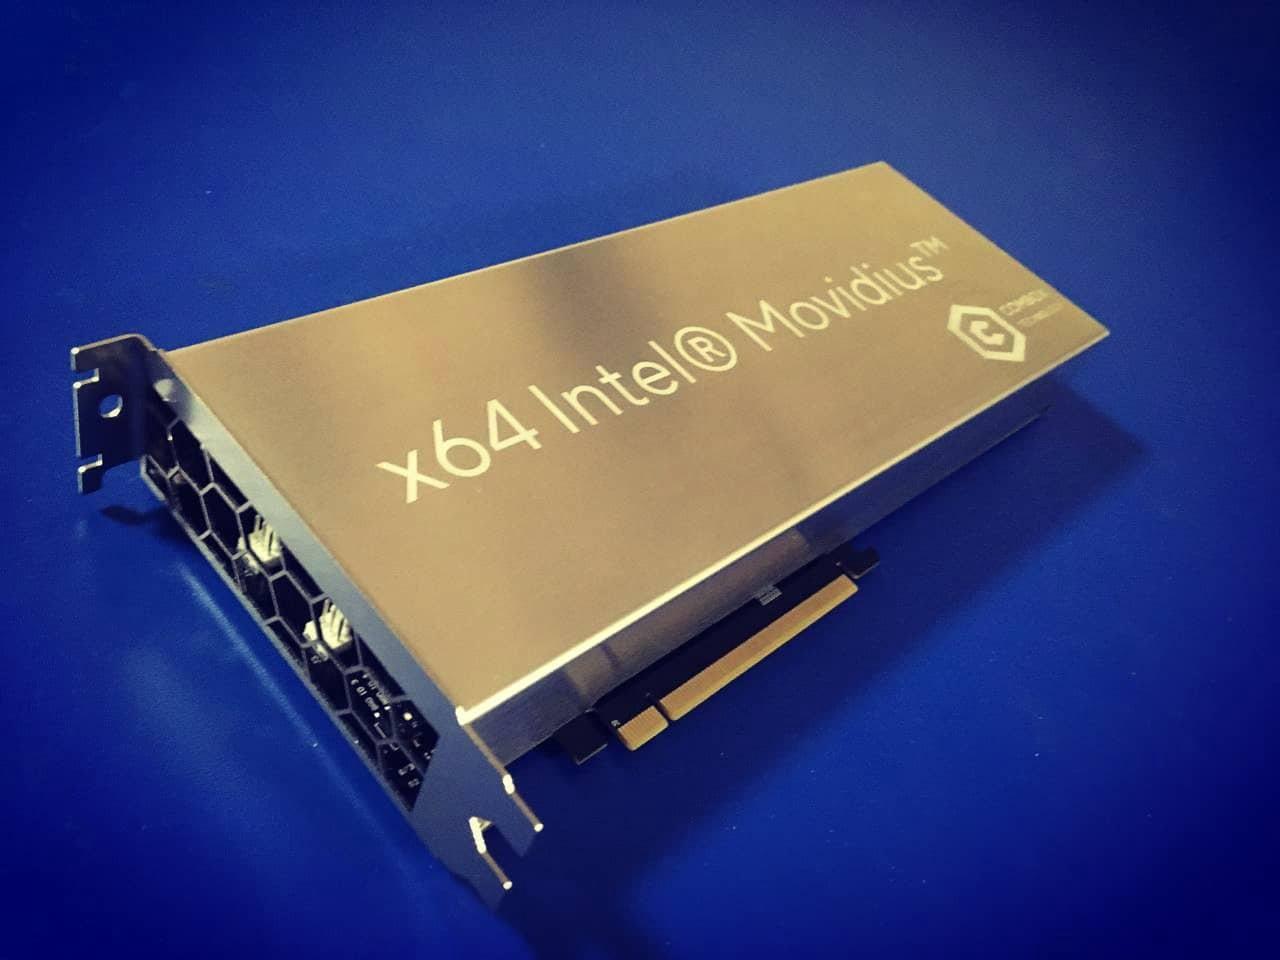 ComBox x64 Movidius Blade Board